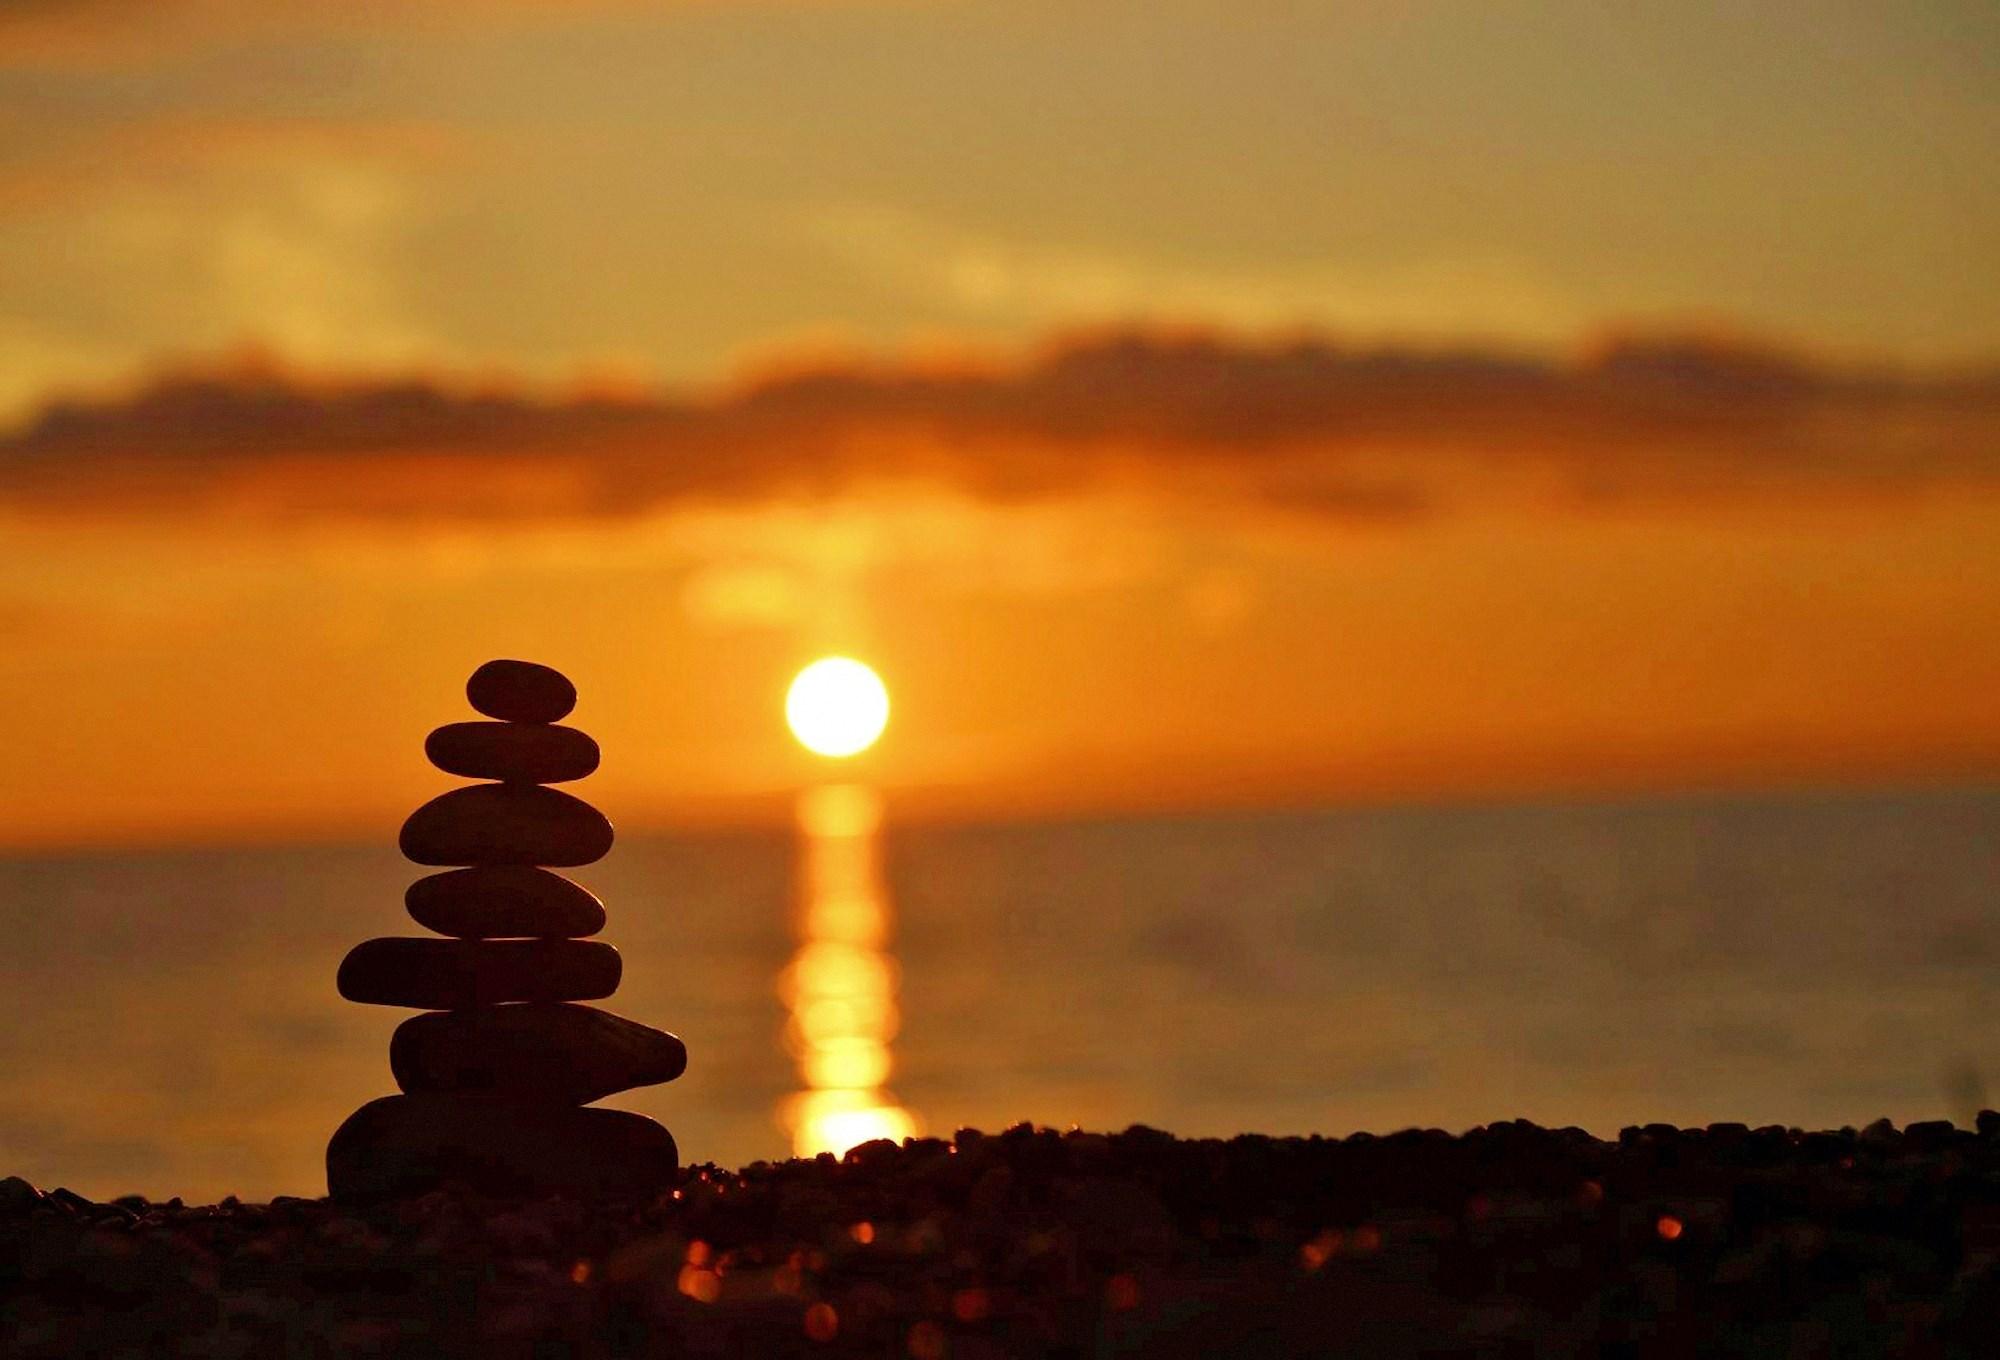 00 Vadim Barzilovich. Romantic Sunset in the Crimea. 2015